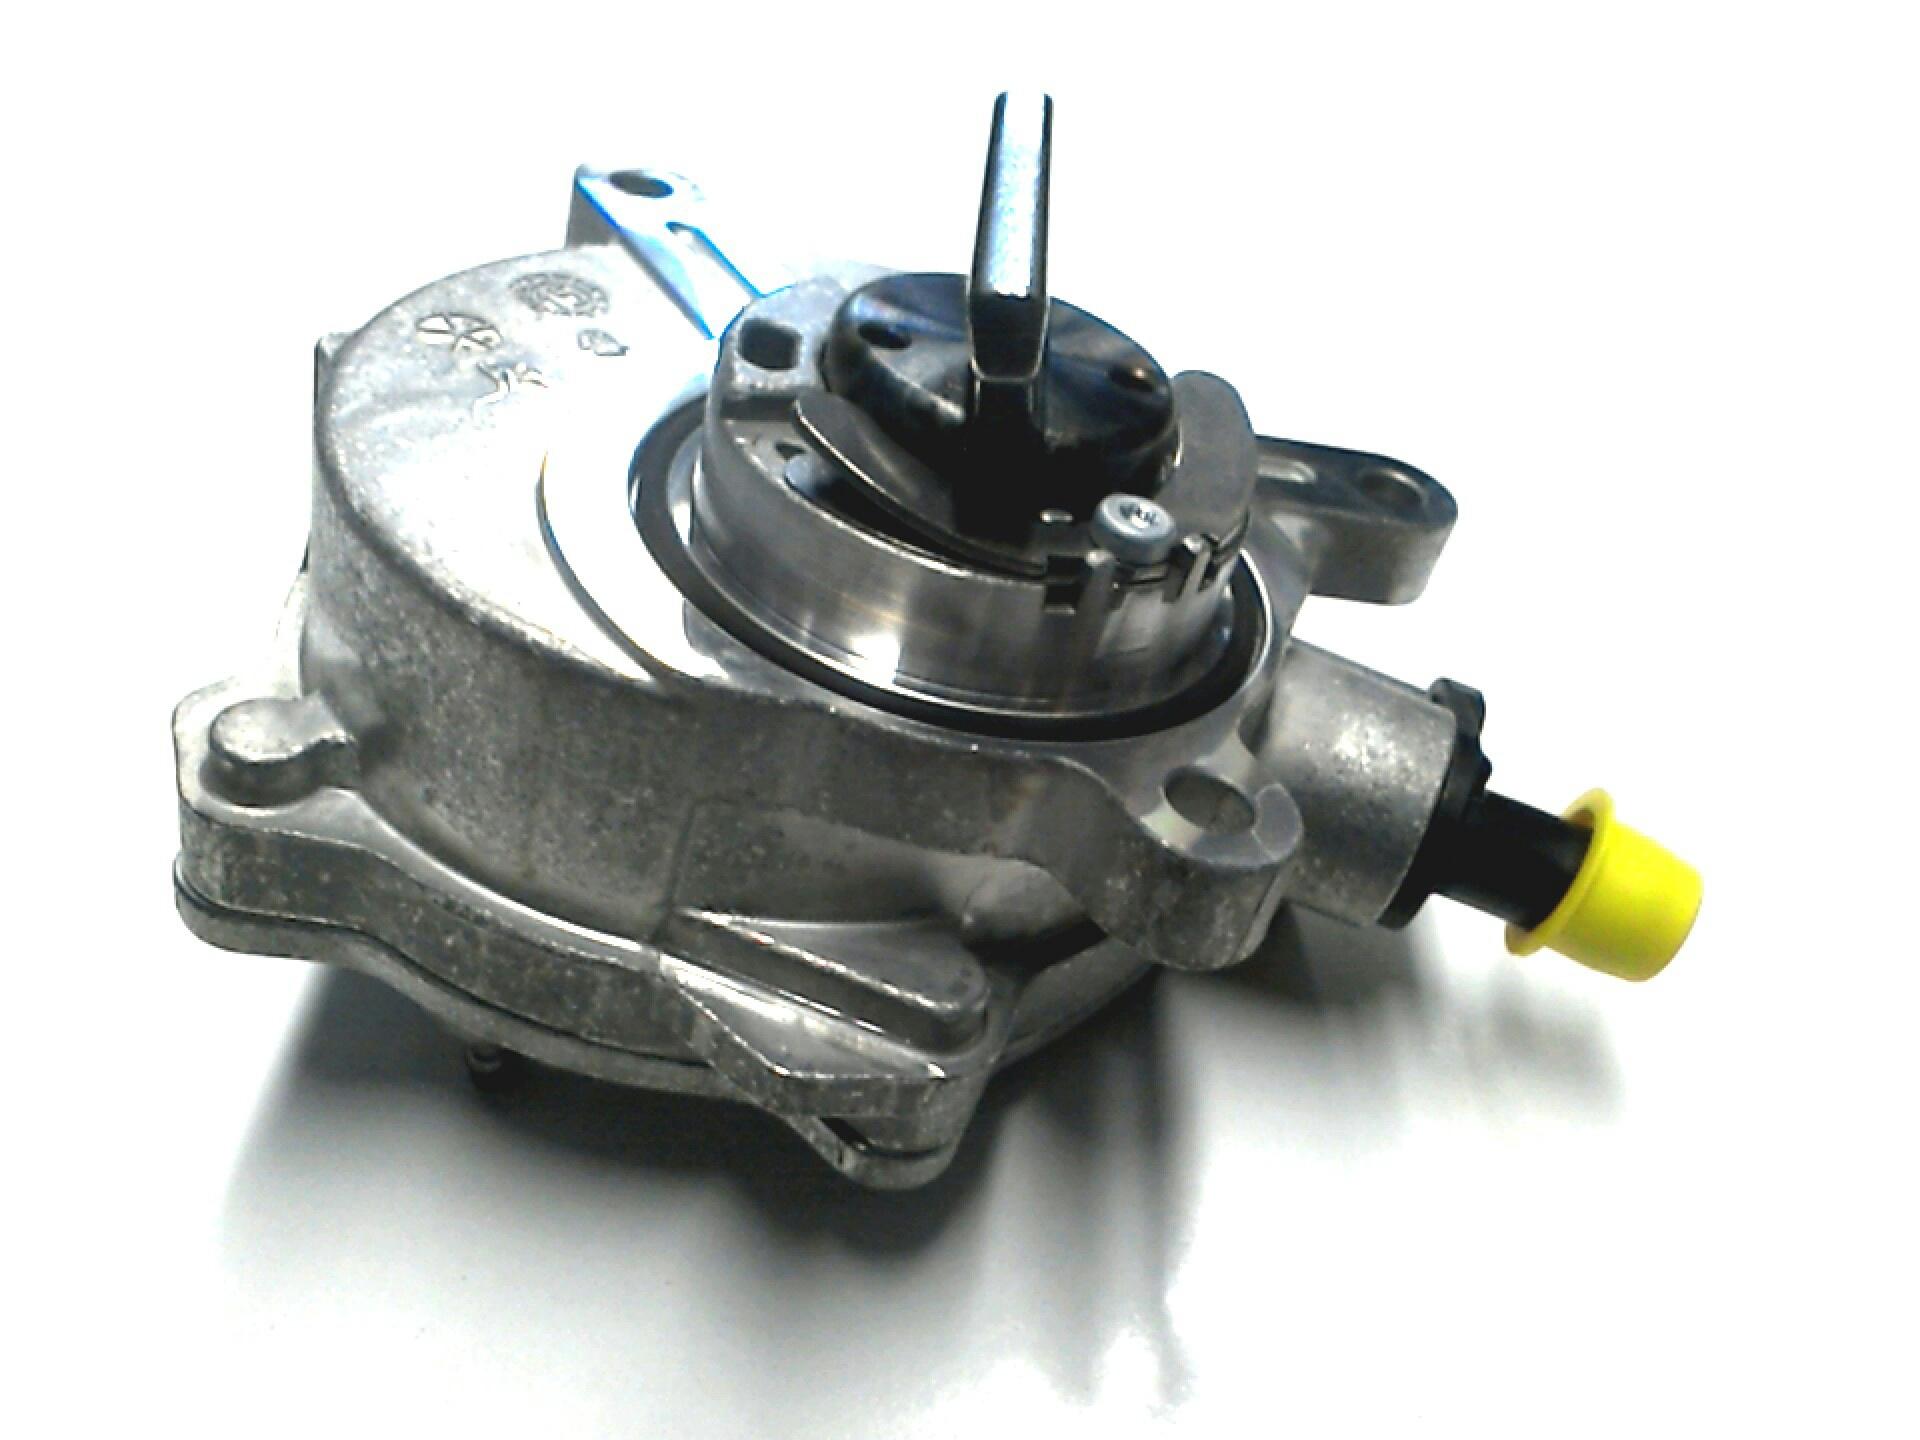 2002 bmw 745li engine diagrams 2002 bmw m5 engine diagram